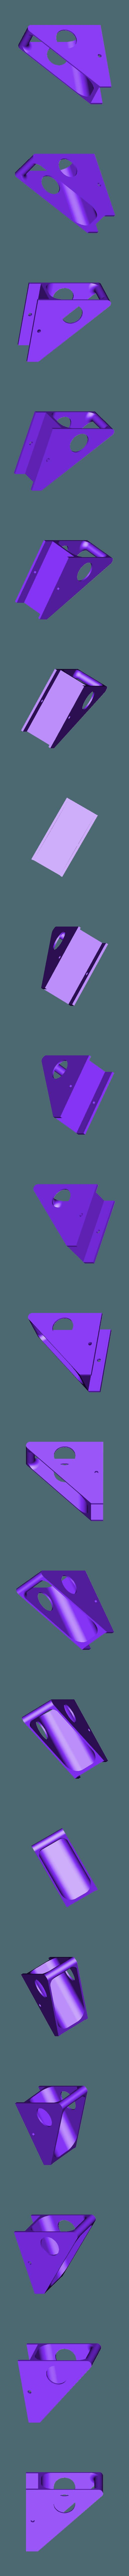 Left_Landing_Gear.stl Download free STL file Experimental Multirotor • 3D printable model, SeanTheITGuy